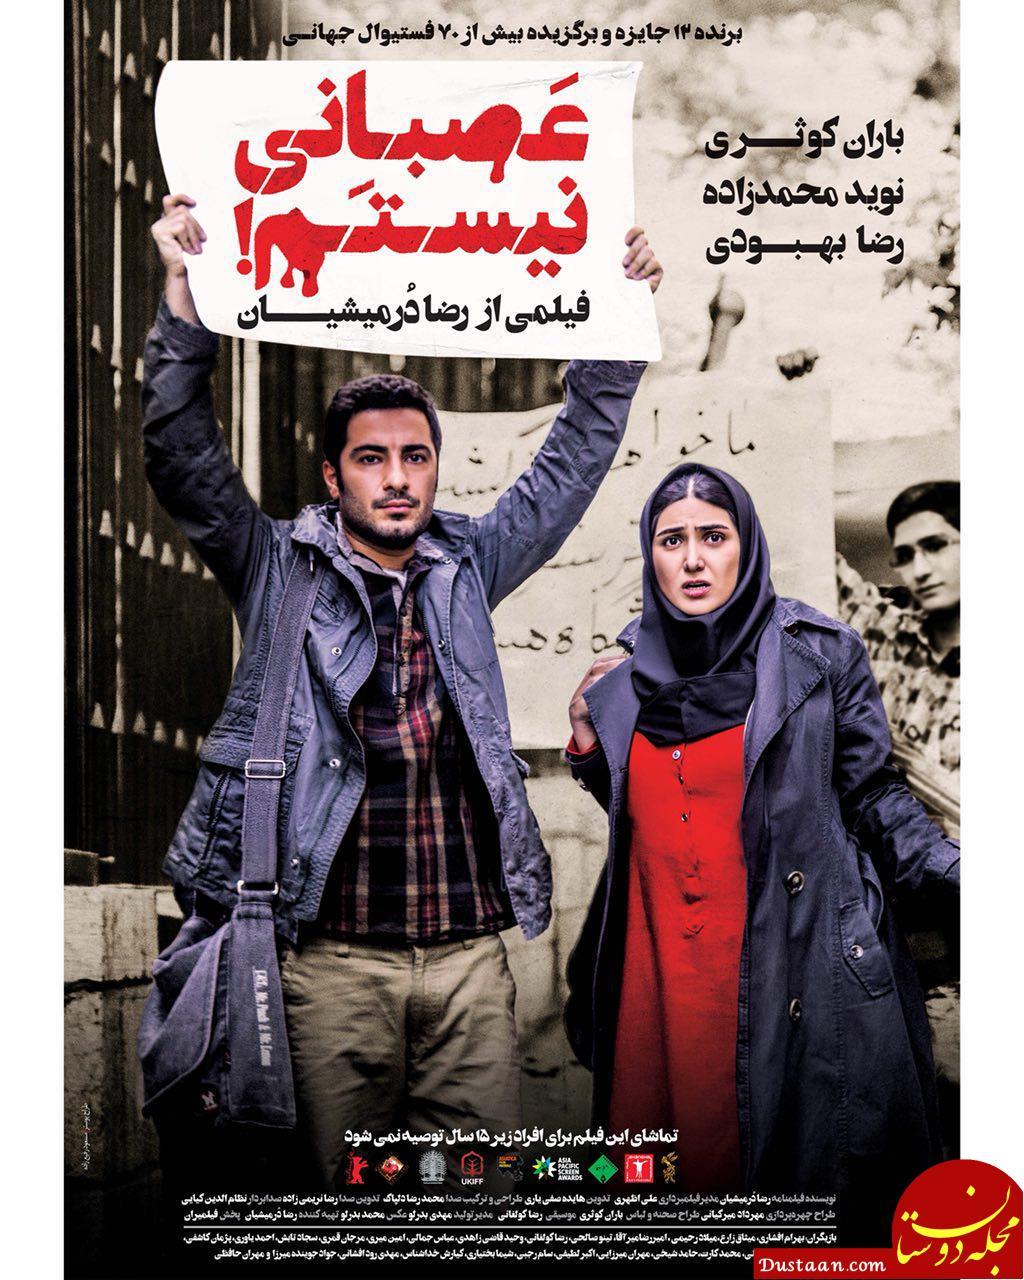 www.dustaan.com رونمایی از پوستر «عصبانی نیستم!» +عکس